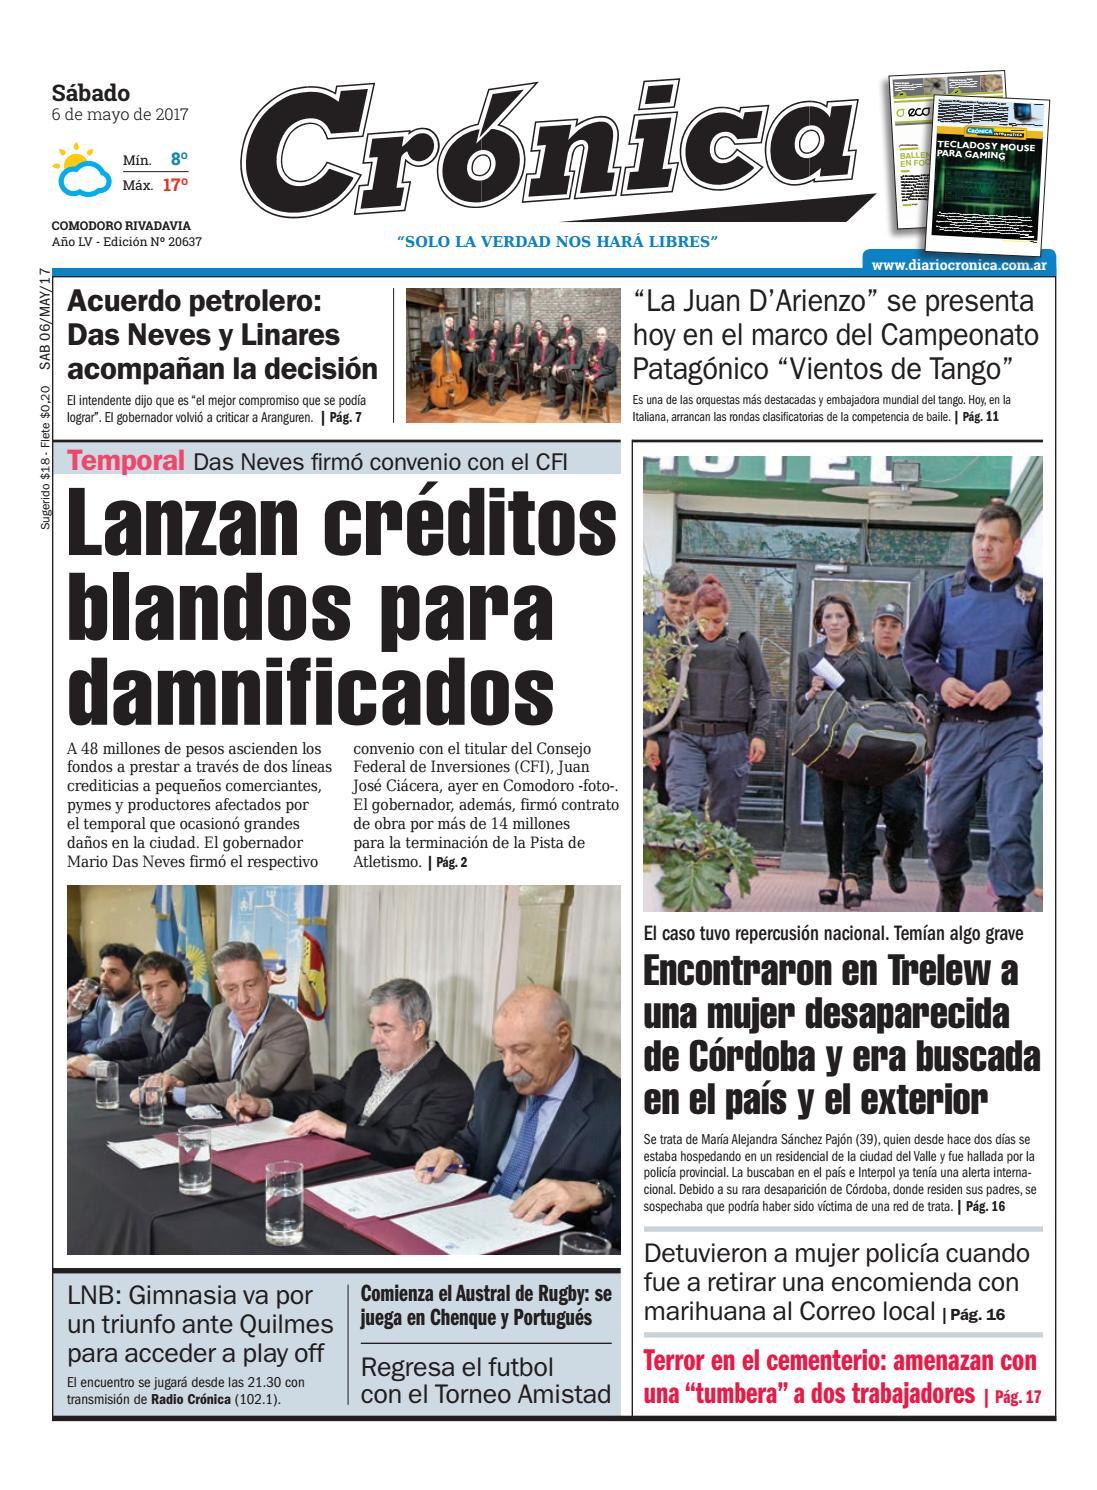 4ed44964ad12f2bf558d628699925dbc by Diario Crónica - issuu